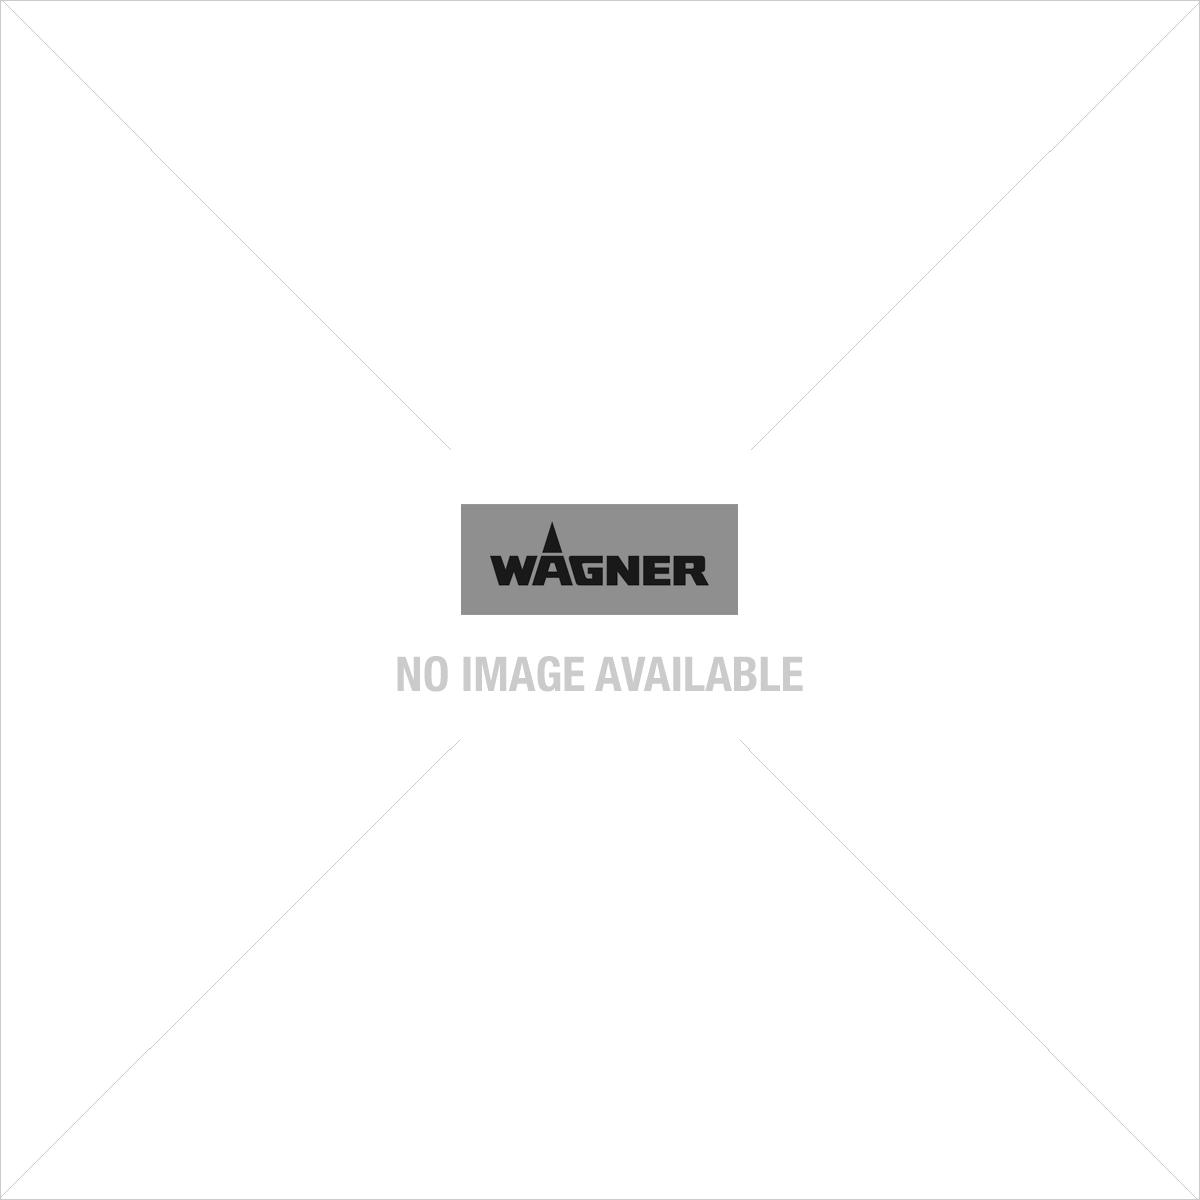 Pomp herstelkit PP 117 Wagner project pro 117